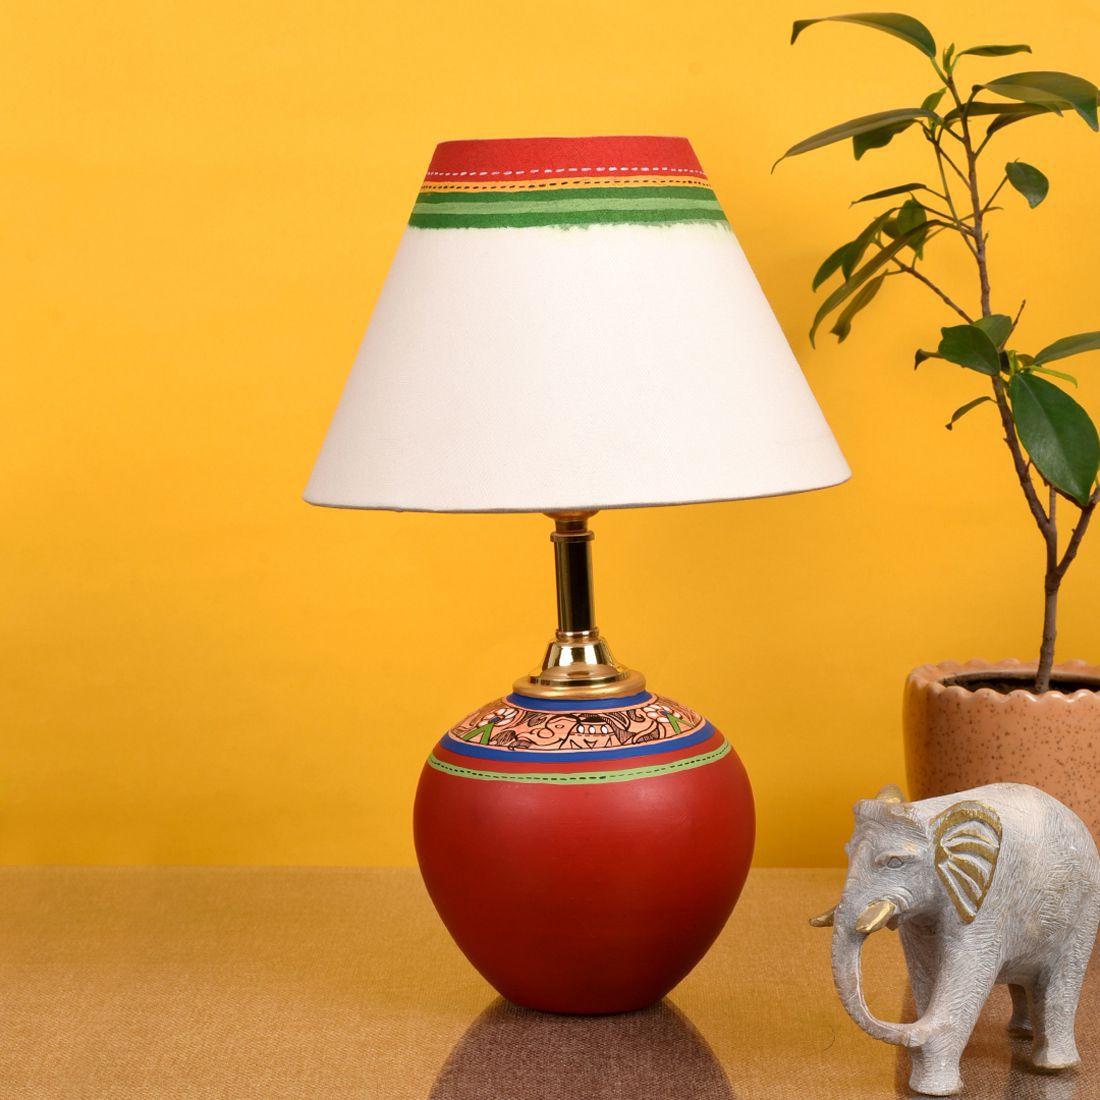 Aakriti Art Creations Terracotta Table Lamp - Pack of 1